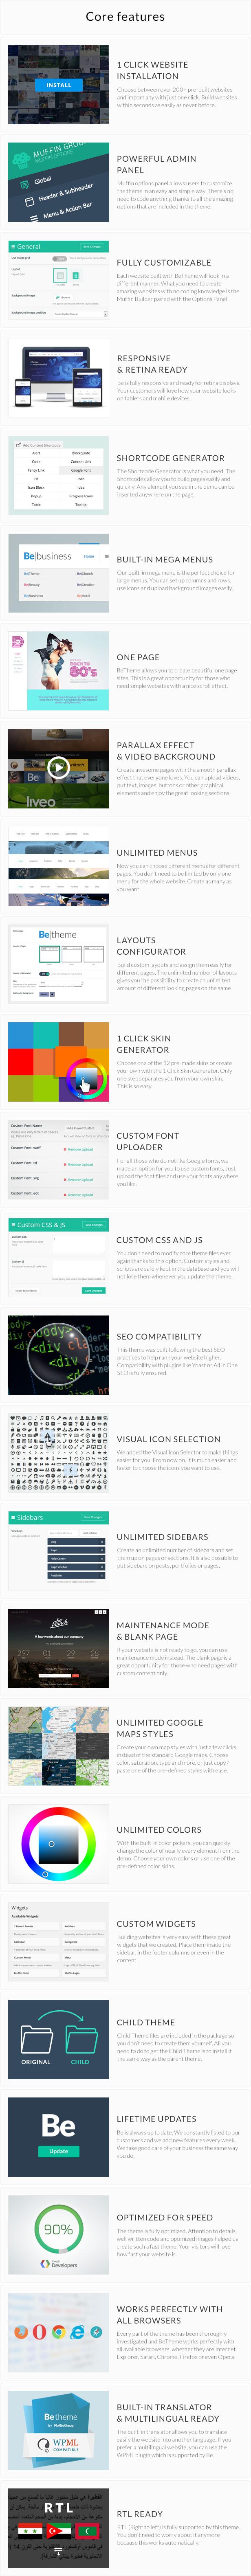 betheme11 - BeTheme - Responsive Multi-Purpose WordPress Theme